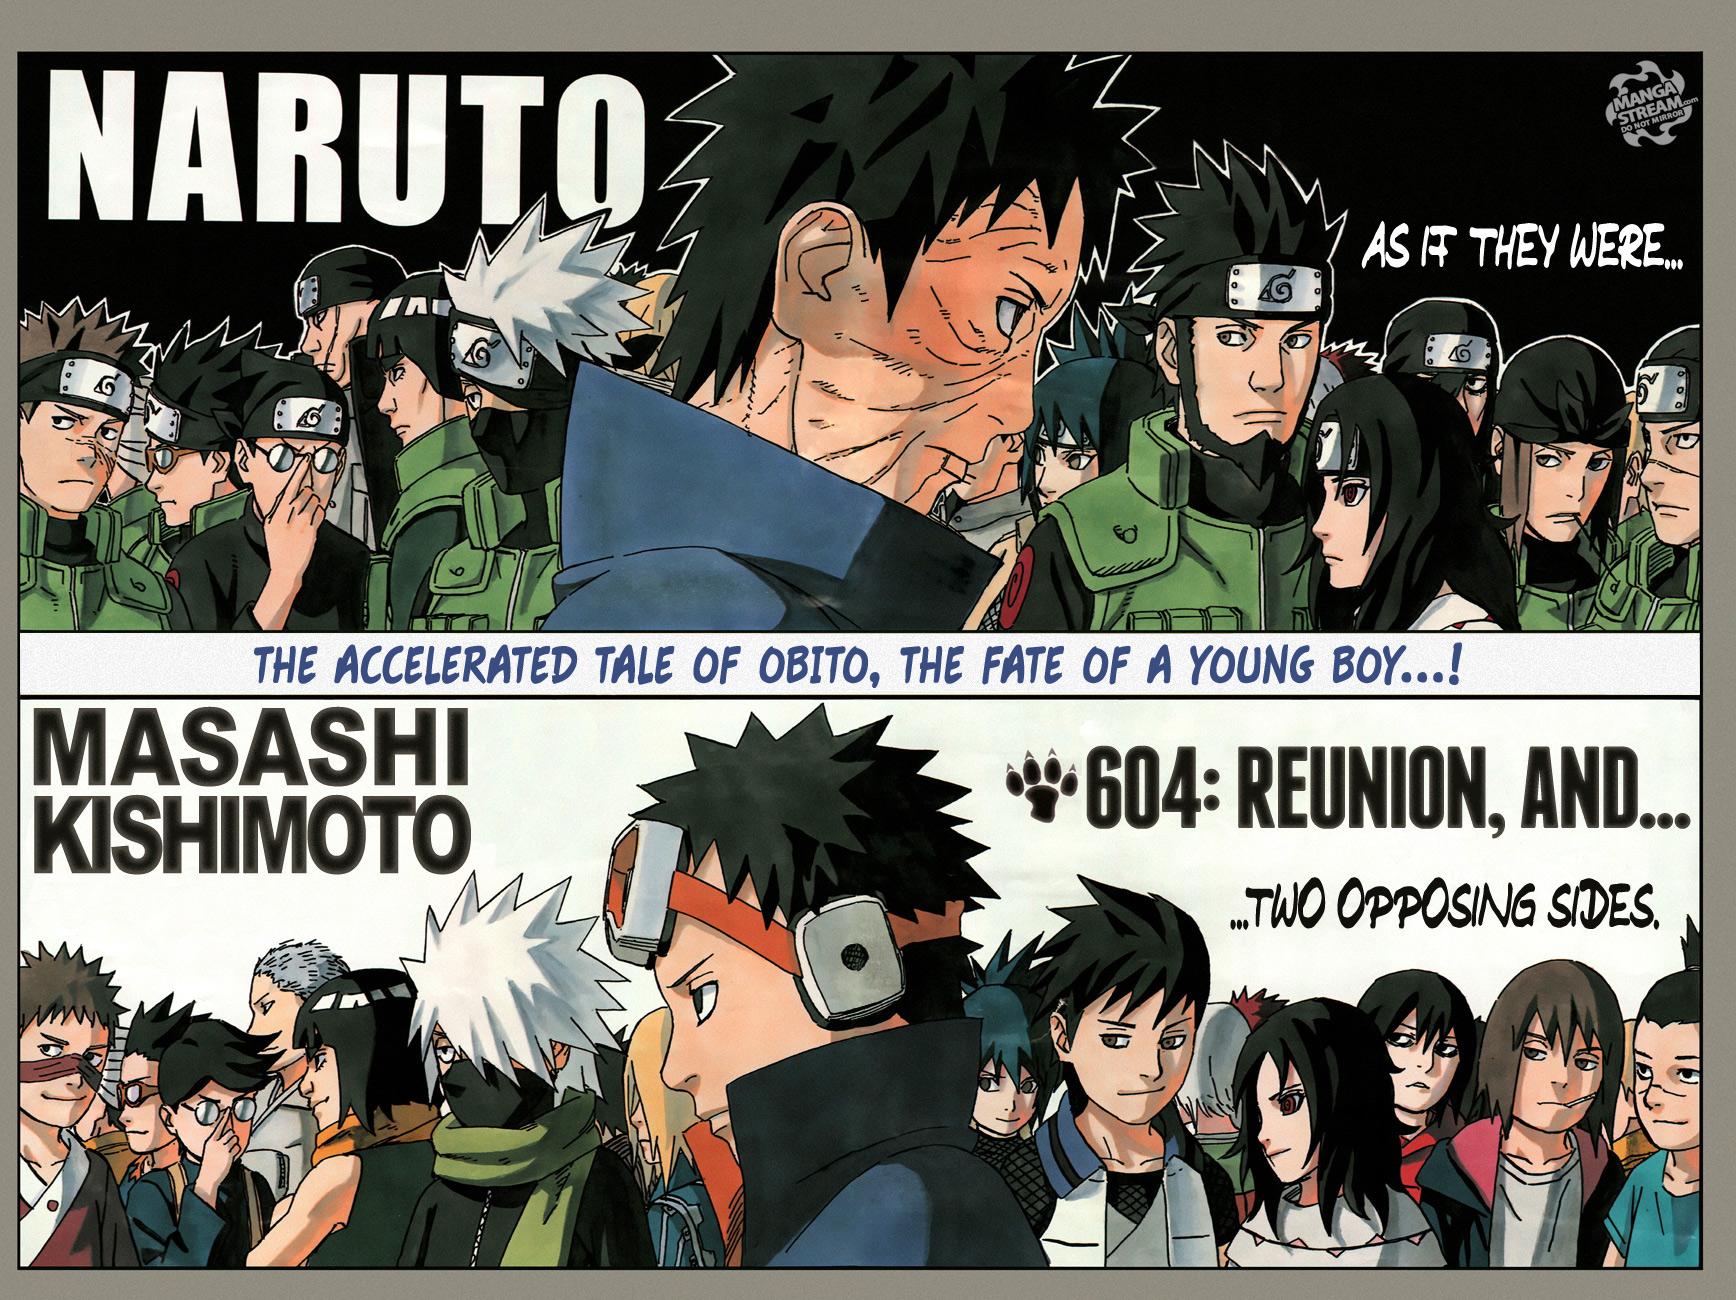 Kakashi Introducing Himself Naruto